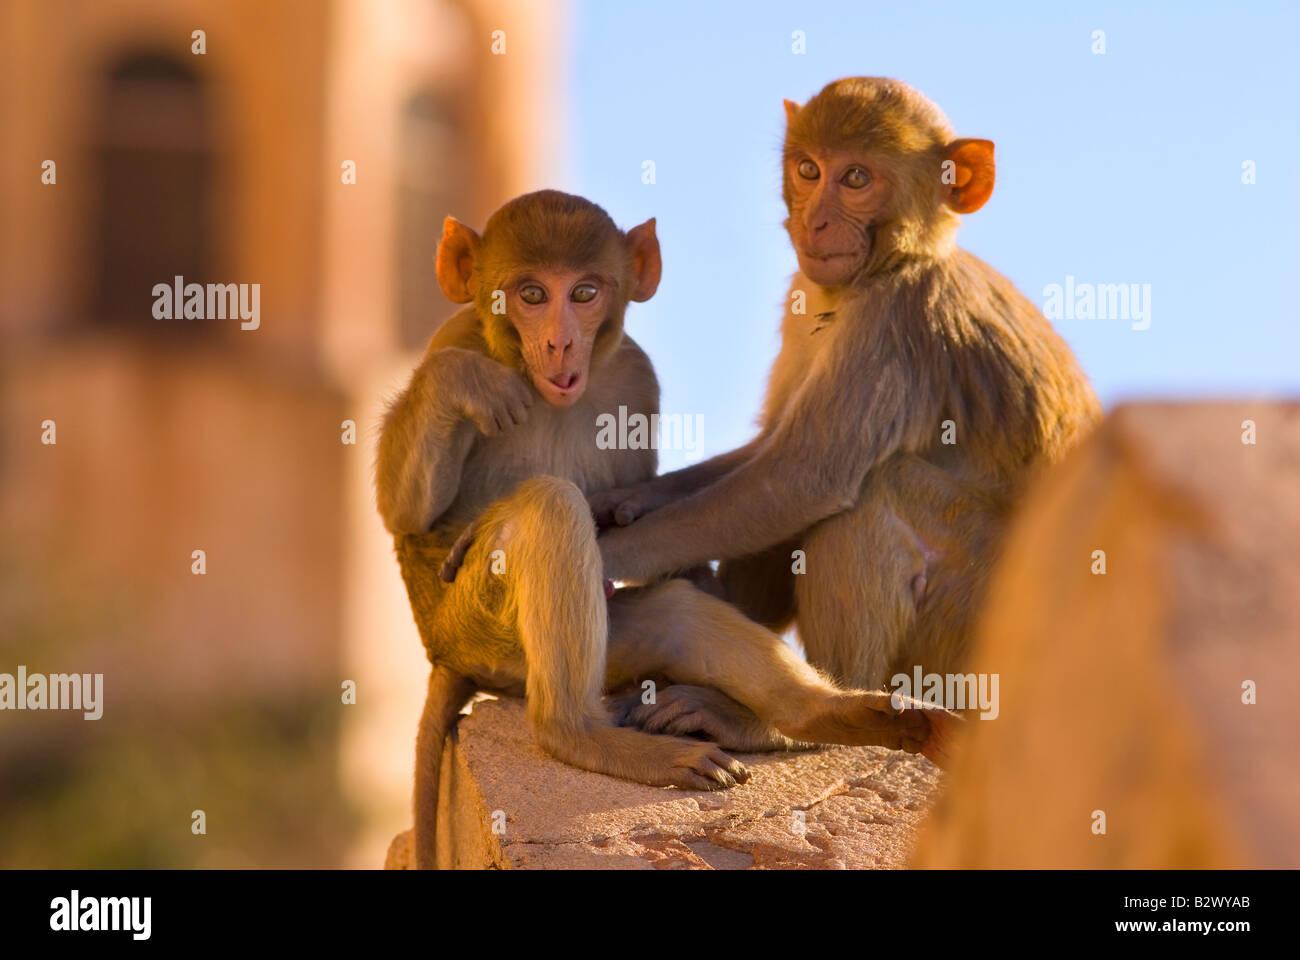 Le scimmie a Tiger Fort, città di Jaipur, Rajasthan, India, subcontinente, Asia Immagini Stock